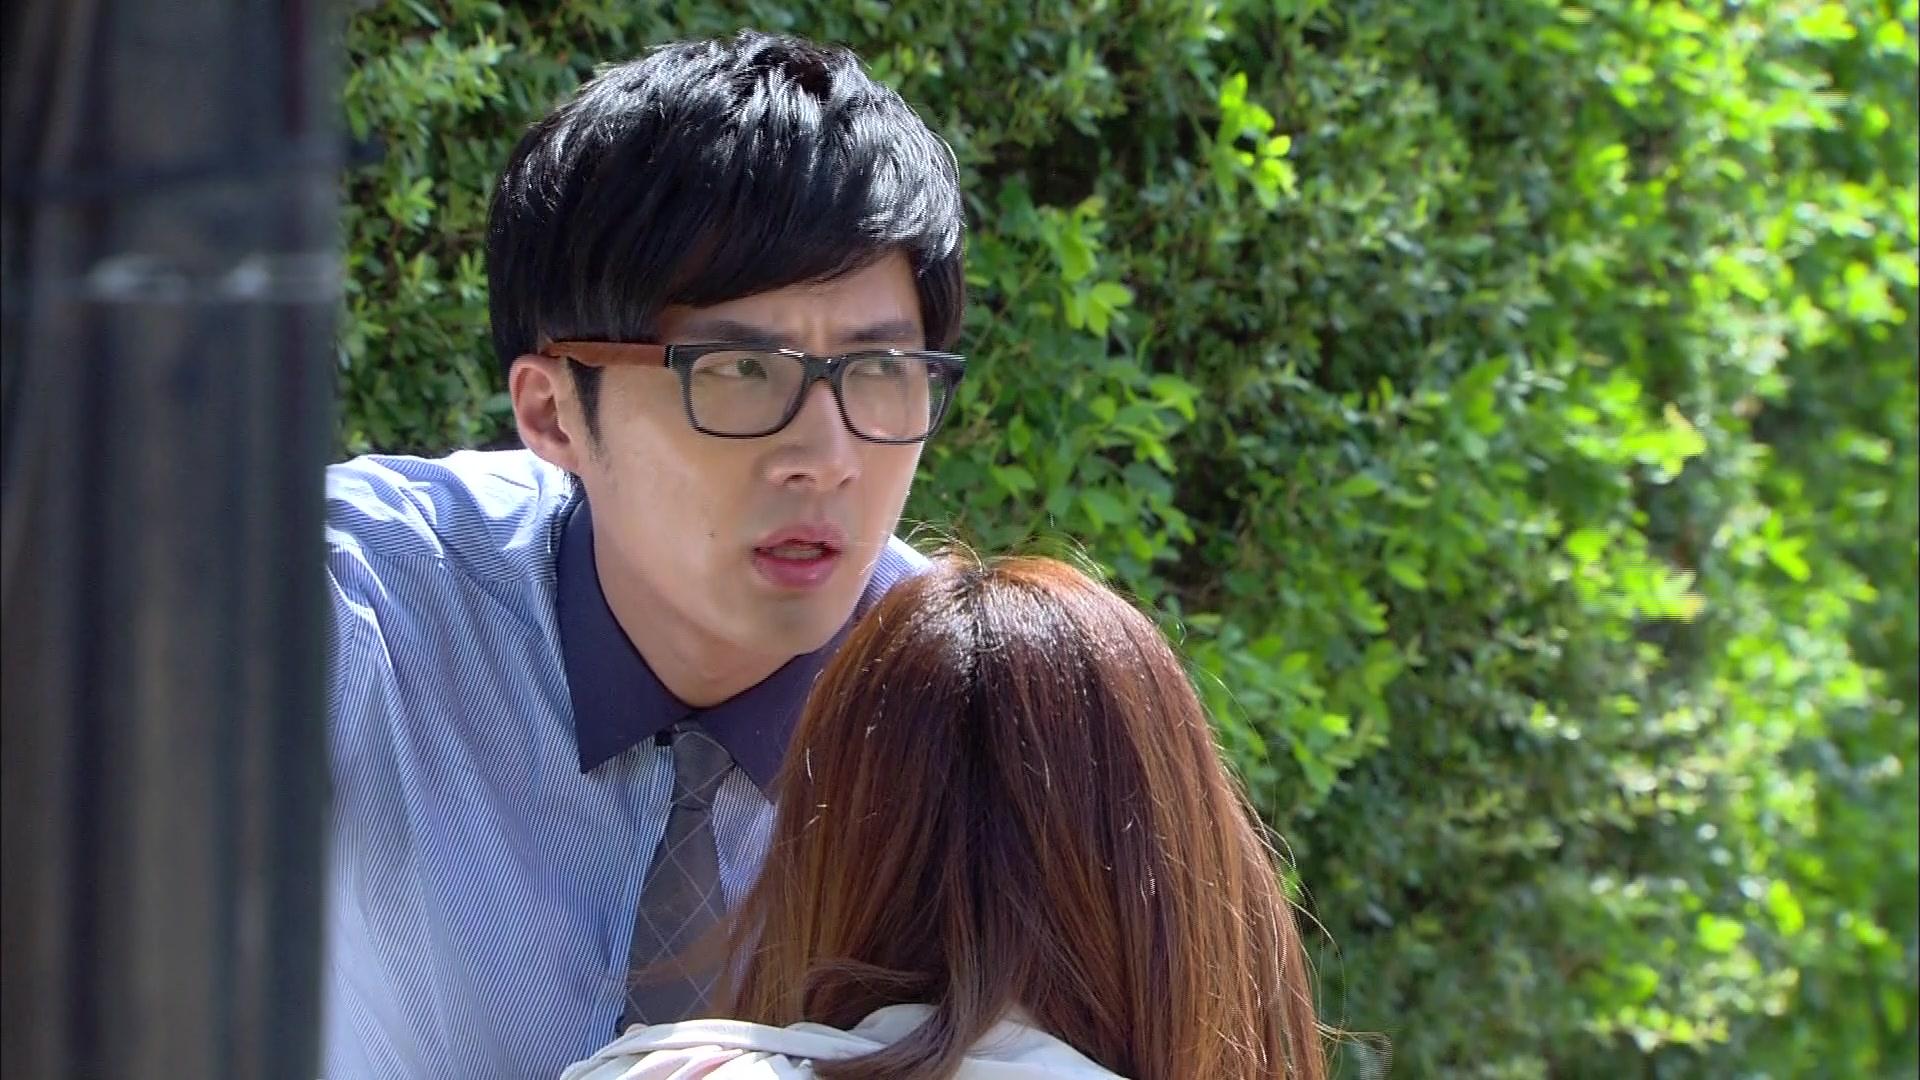 Autumn s concerto wallpaper - Love Around Episode 15 Watch Full Episodes Free Taiwan Tv Shows Rakuten Viki